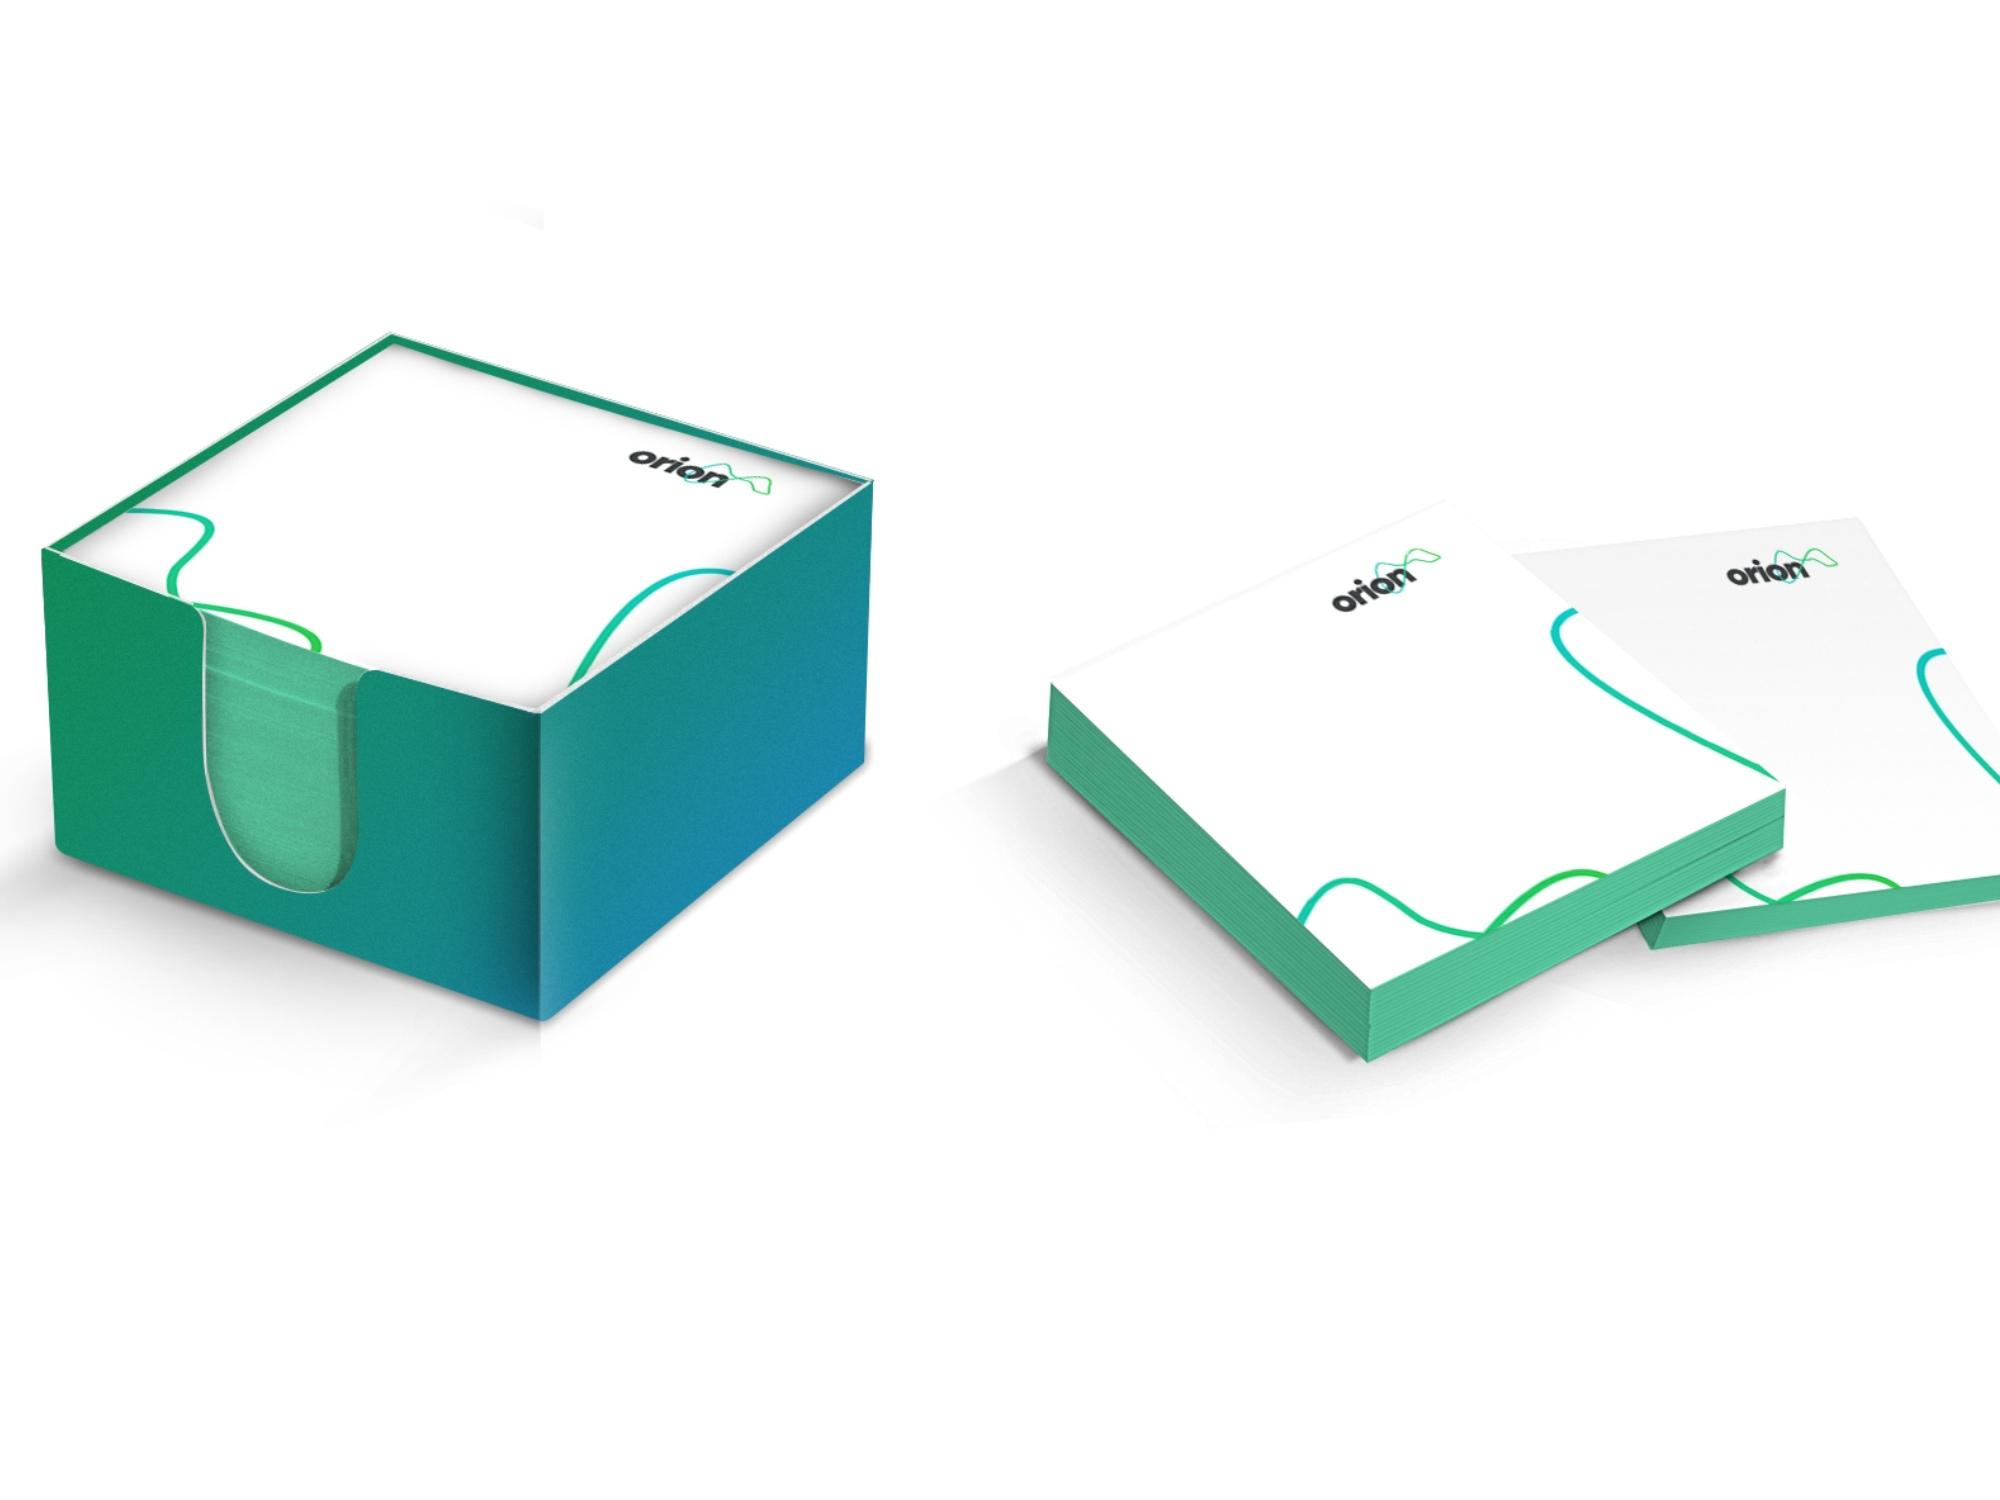 custom paper Block pads made by Kiakiaprint